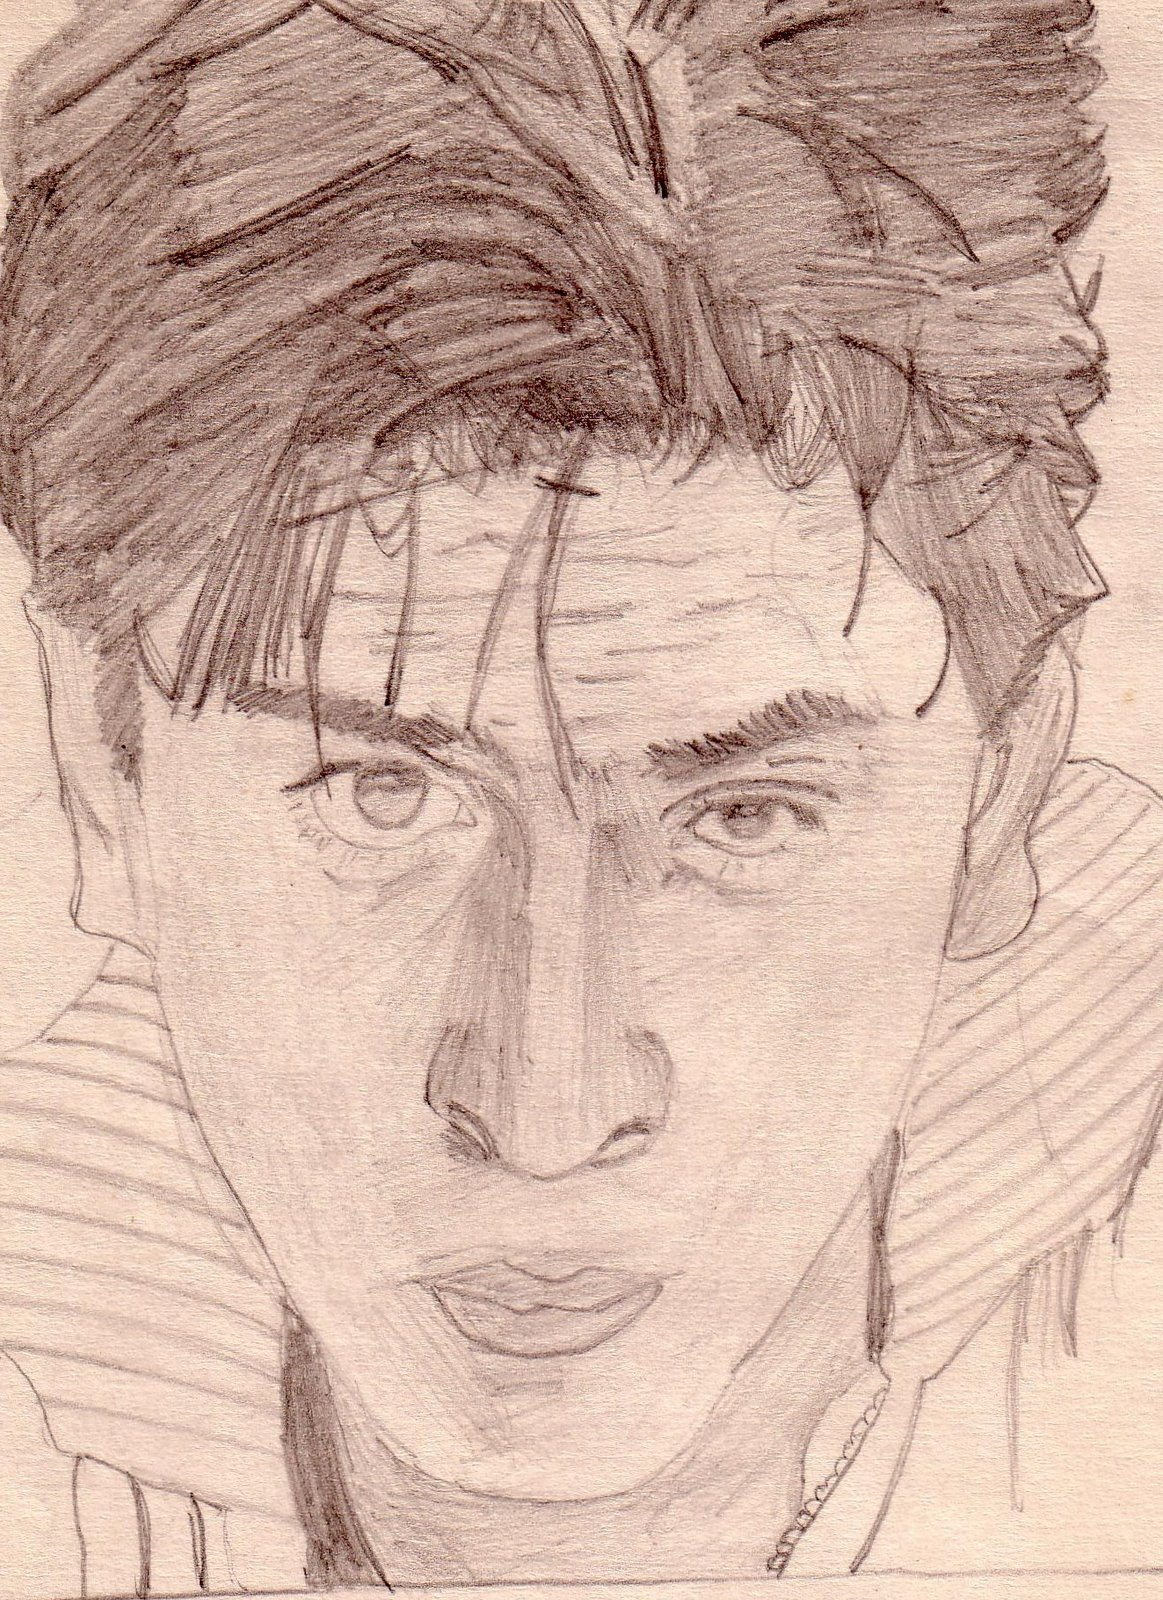 image-SAhahrukh-Khan-Comment-Saurabh-Turakhias-passion-for-celebrity-portraits-mediabrief